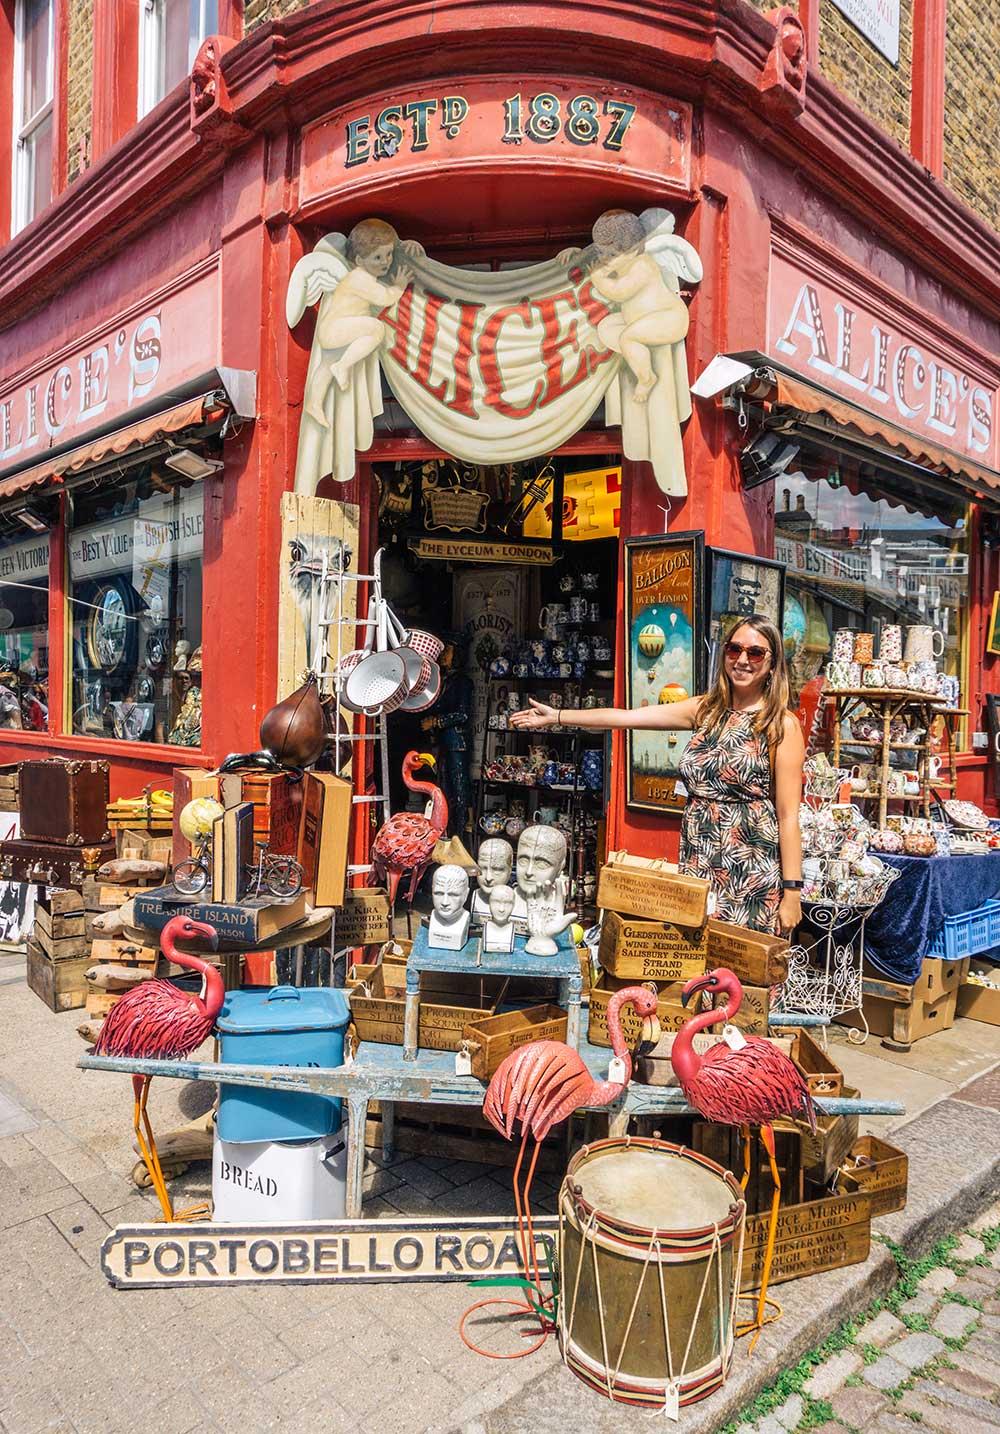 Alices - Portobello Road Market, Notting Hill, West London